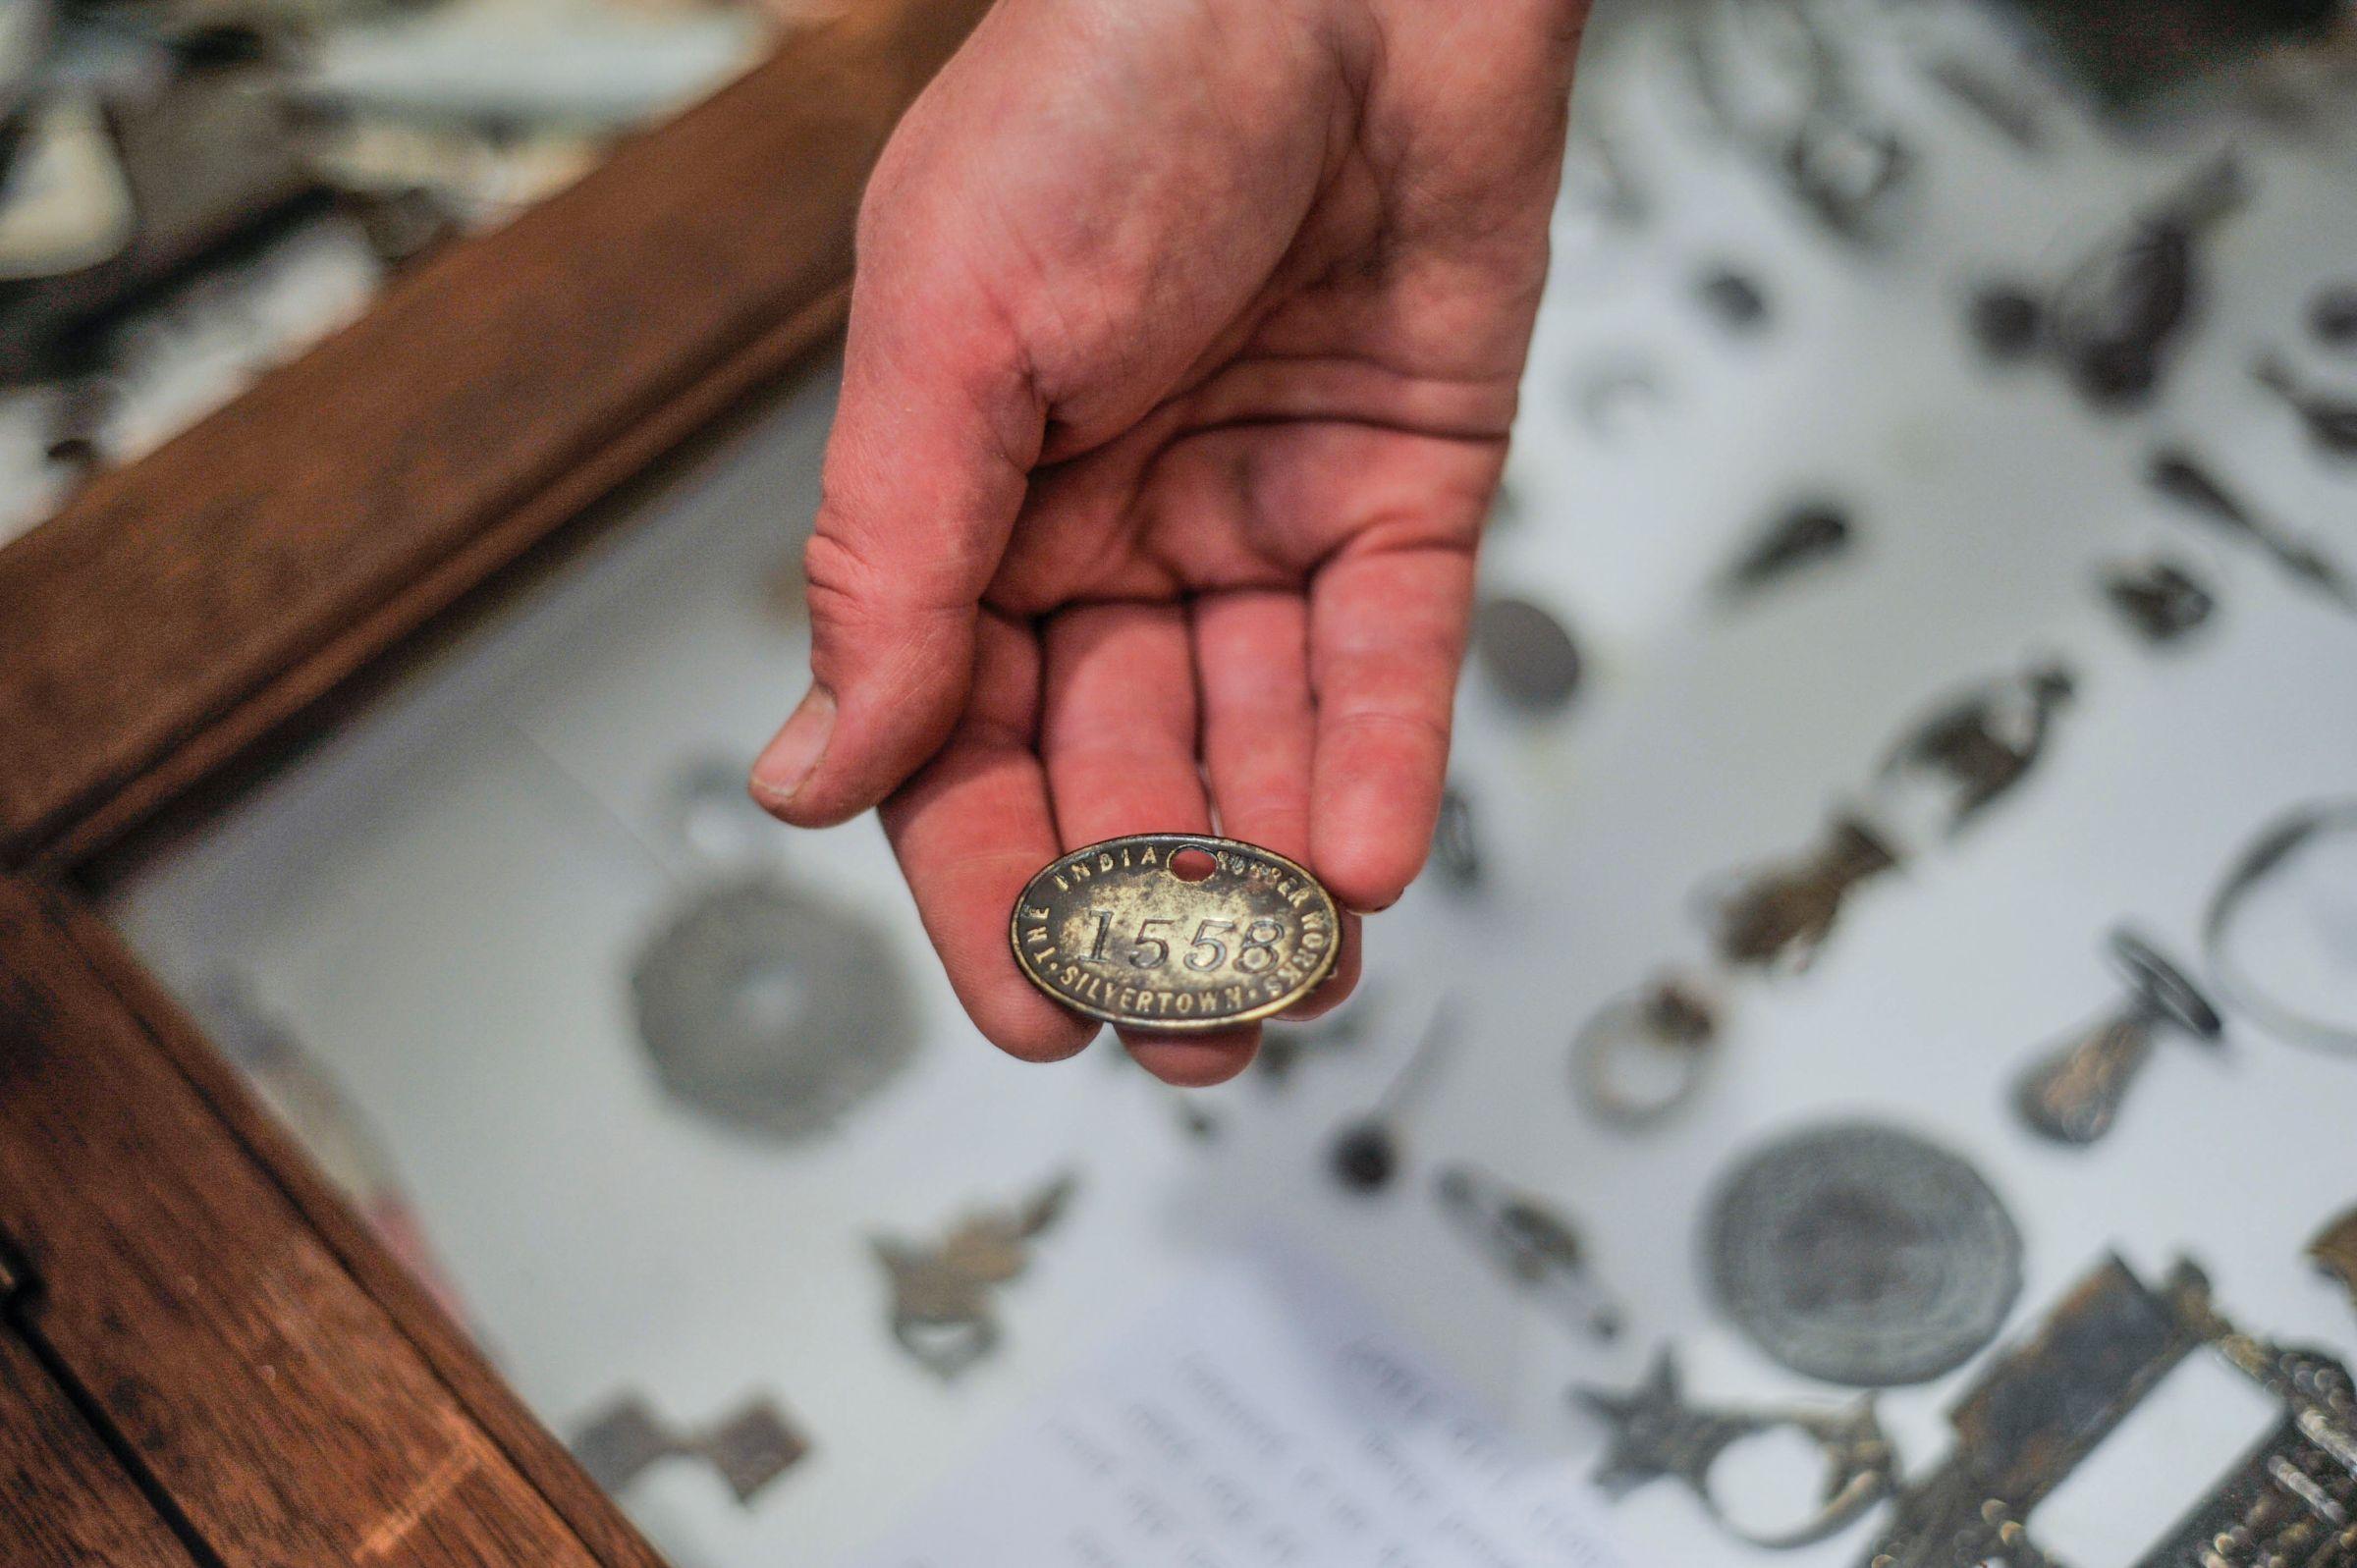 Salvage found near the Royal Docks